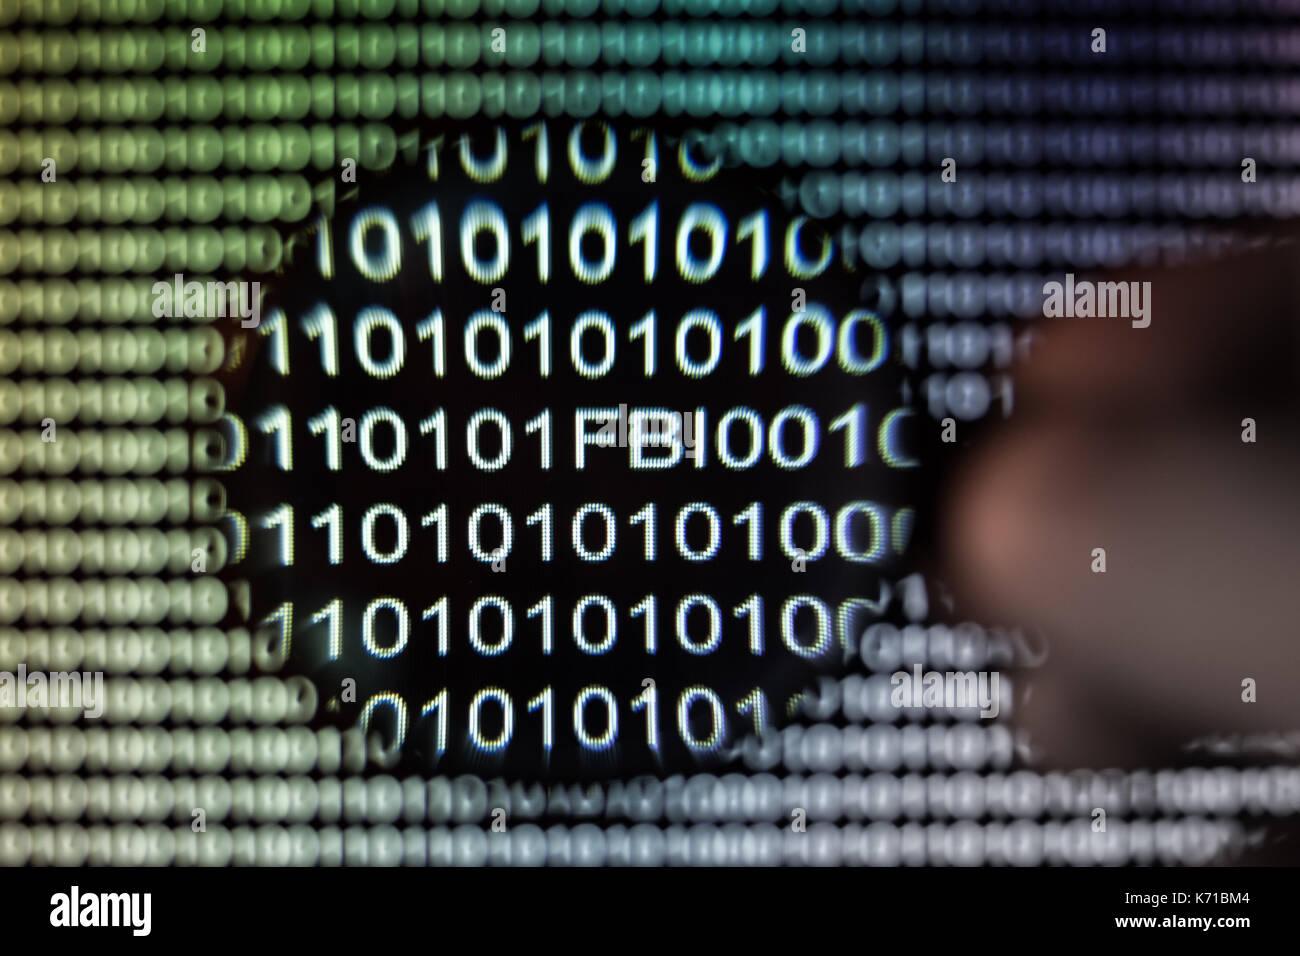 Binary code, magnifying glass shows American FBI, exploit - Stock Image